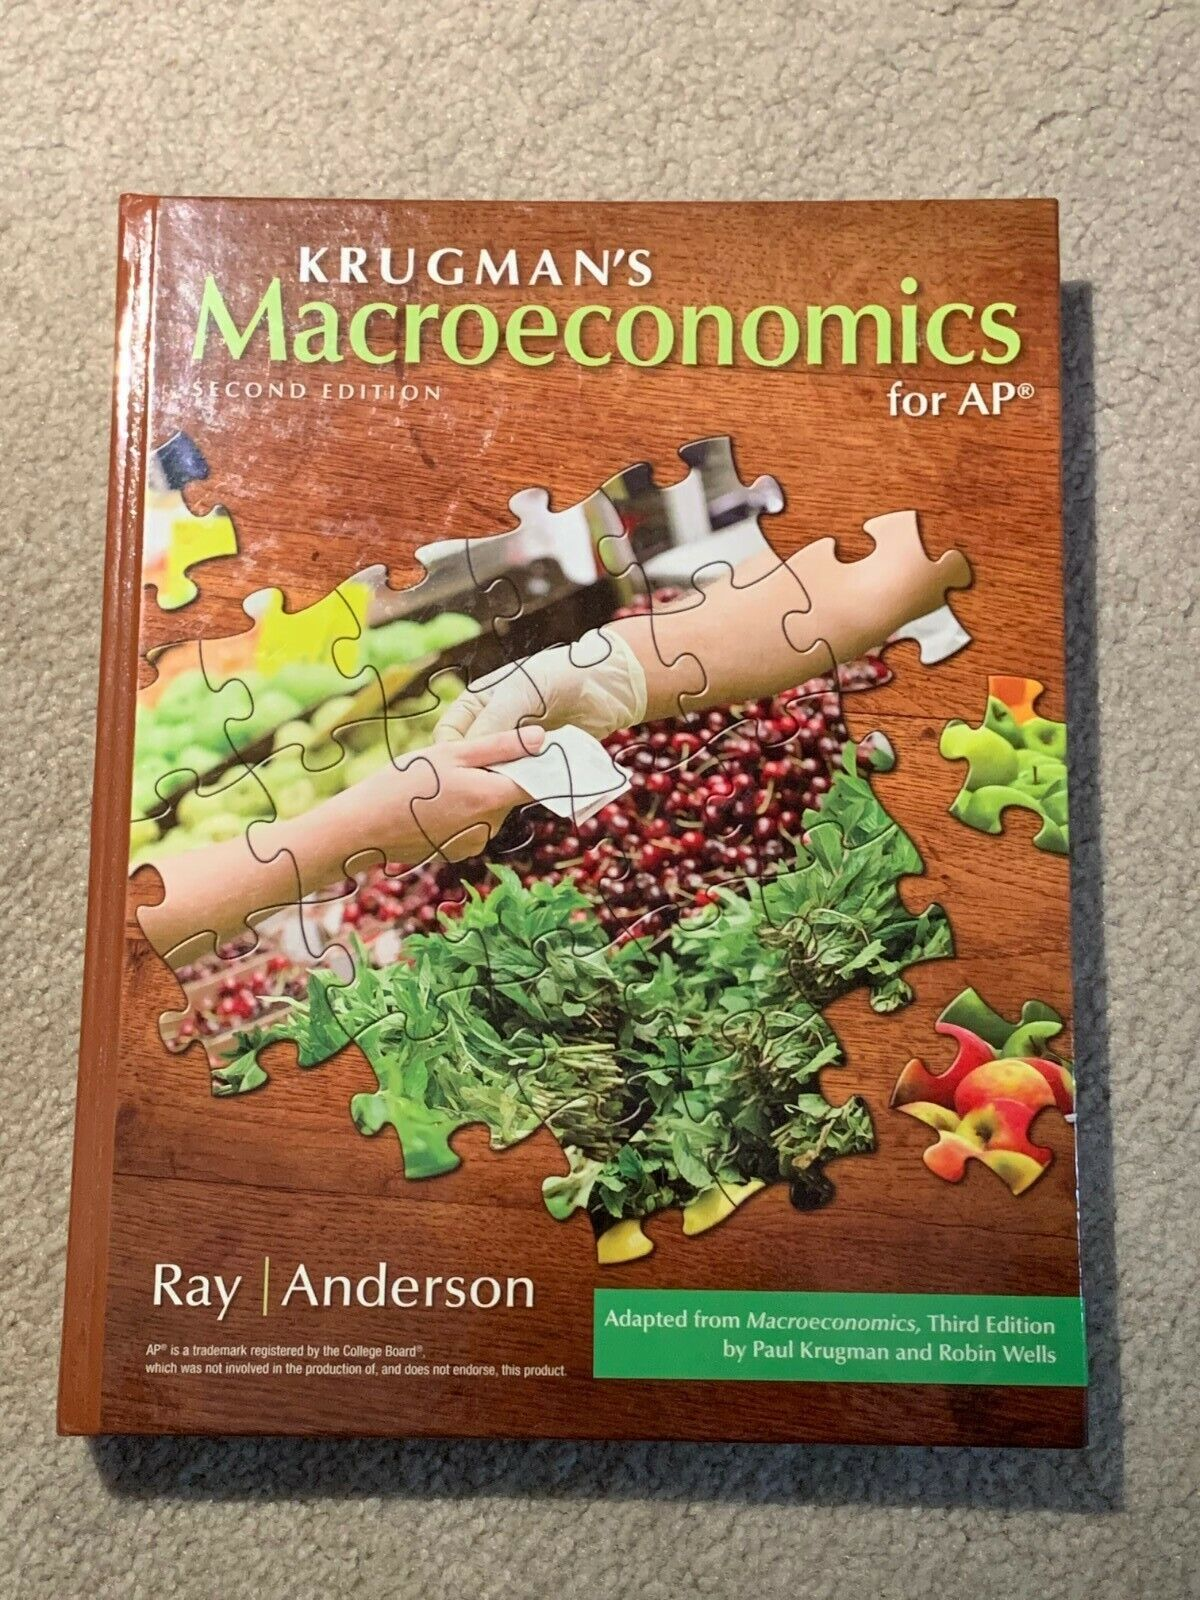 *BRAND NEW* Krugman's Macroeconomics for AP 2nd Edition Ra